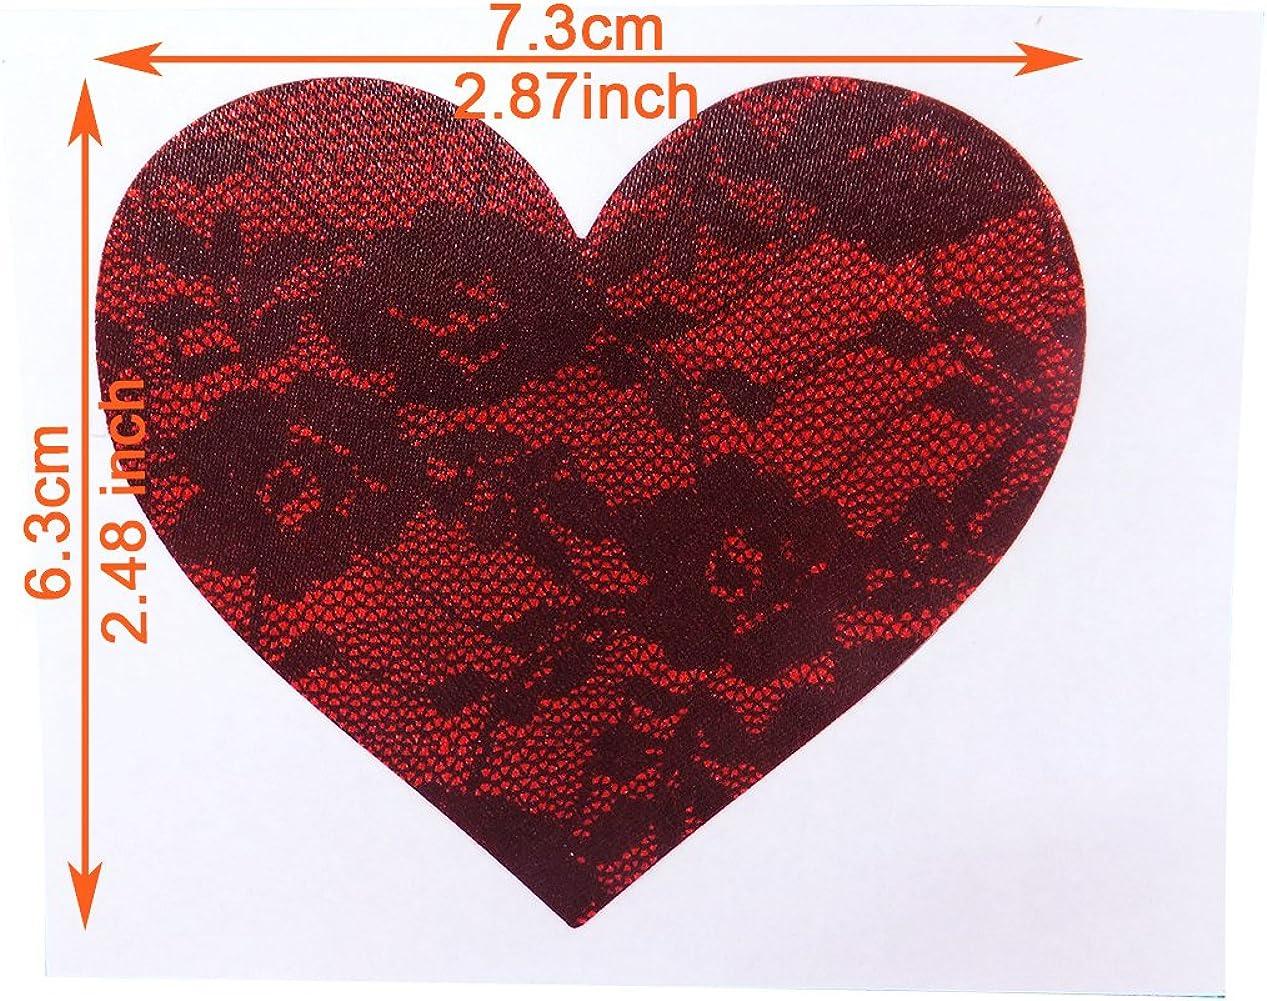 DoHope Disposable Nipple Covers Einweg-Nippel-Abdeckungen Kleber-Fleck-Brust-Br/äutigam-B/üstenhalter-Aufkleber